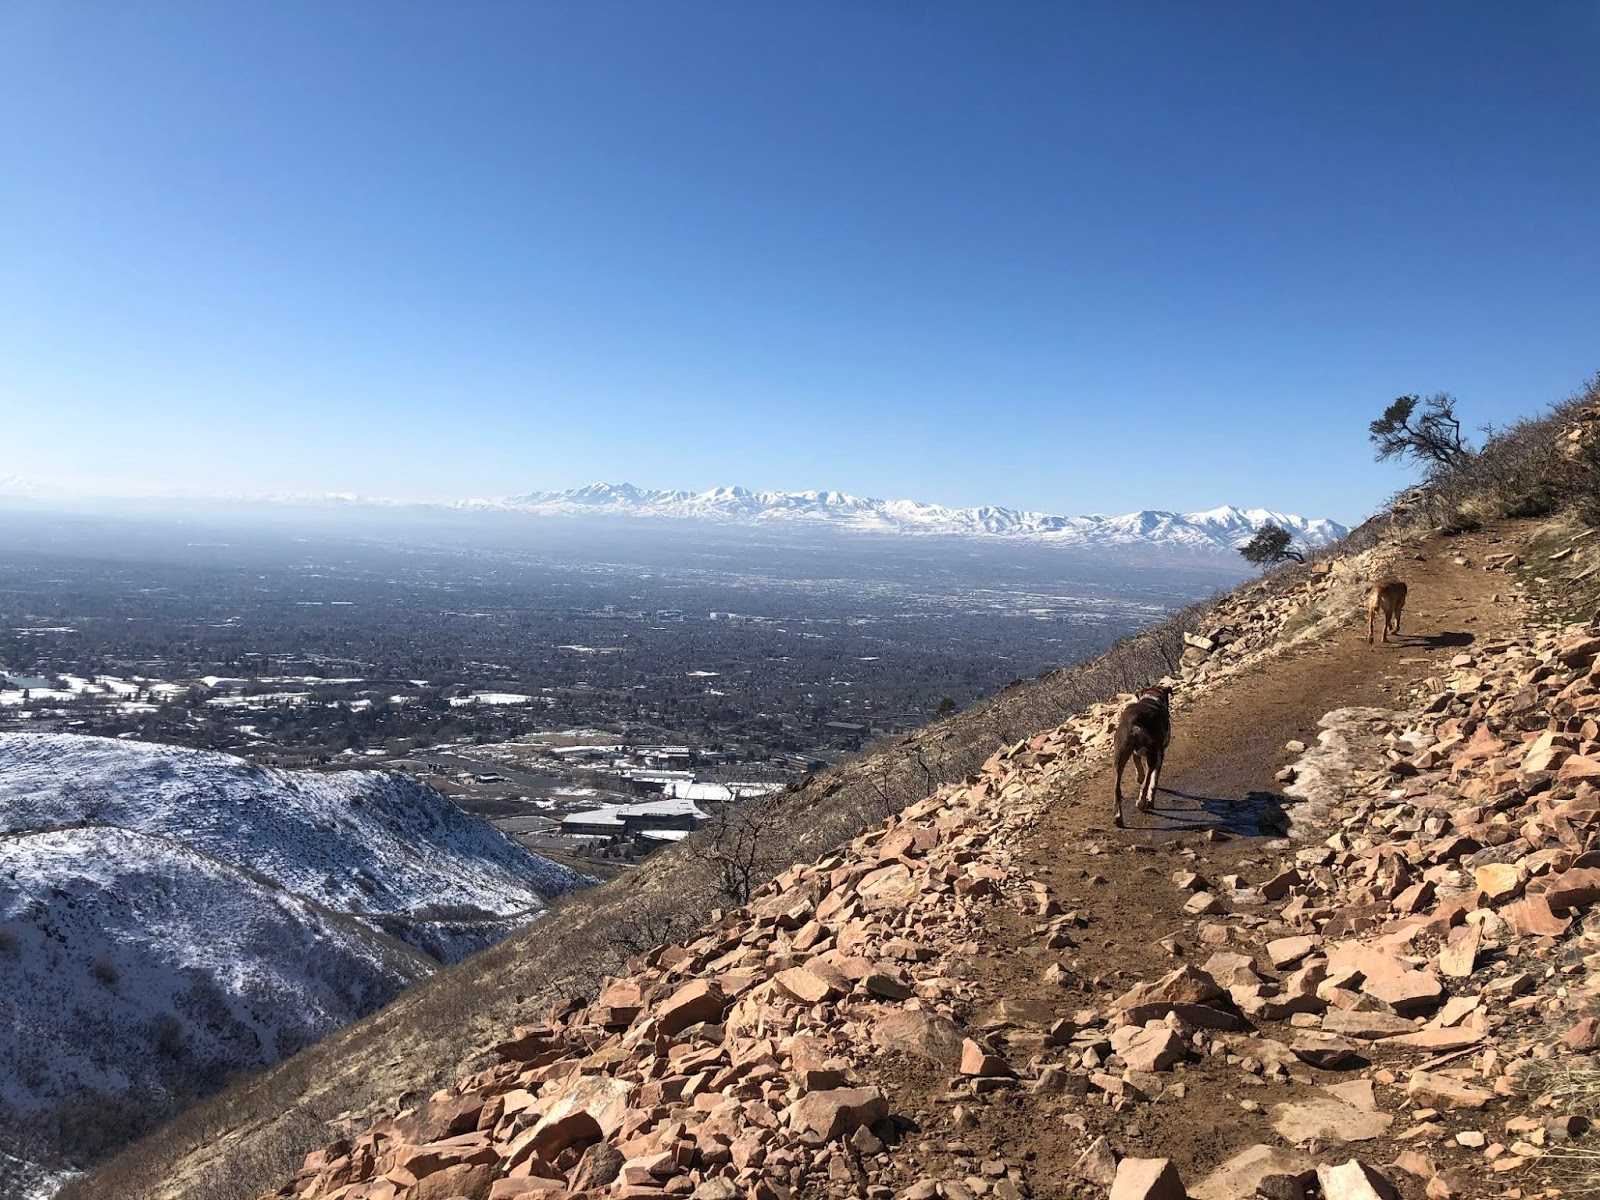 Hiking to The Living Room, Salt Lake City